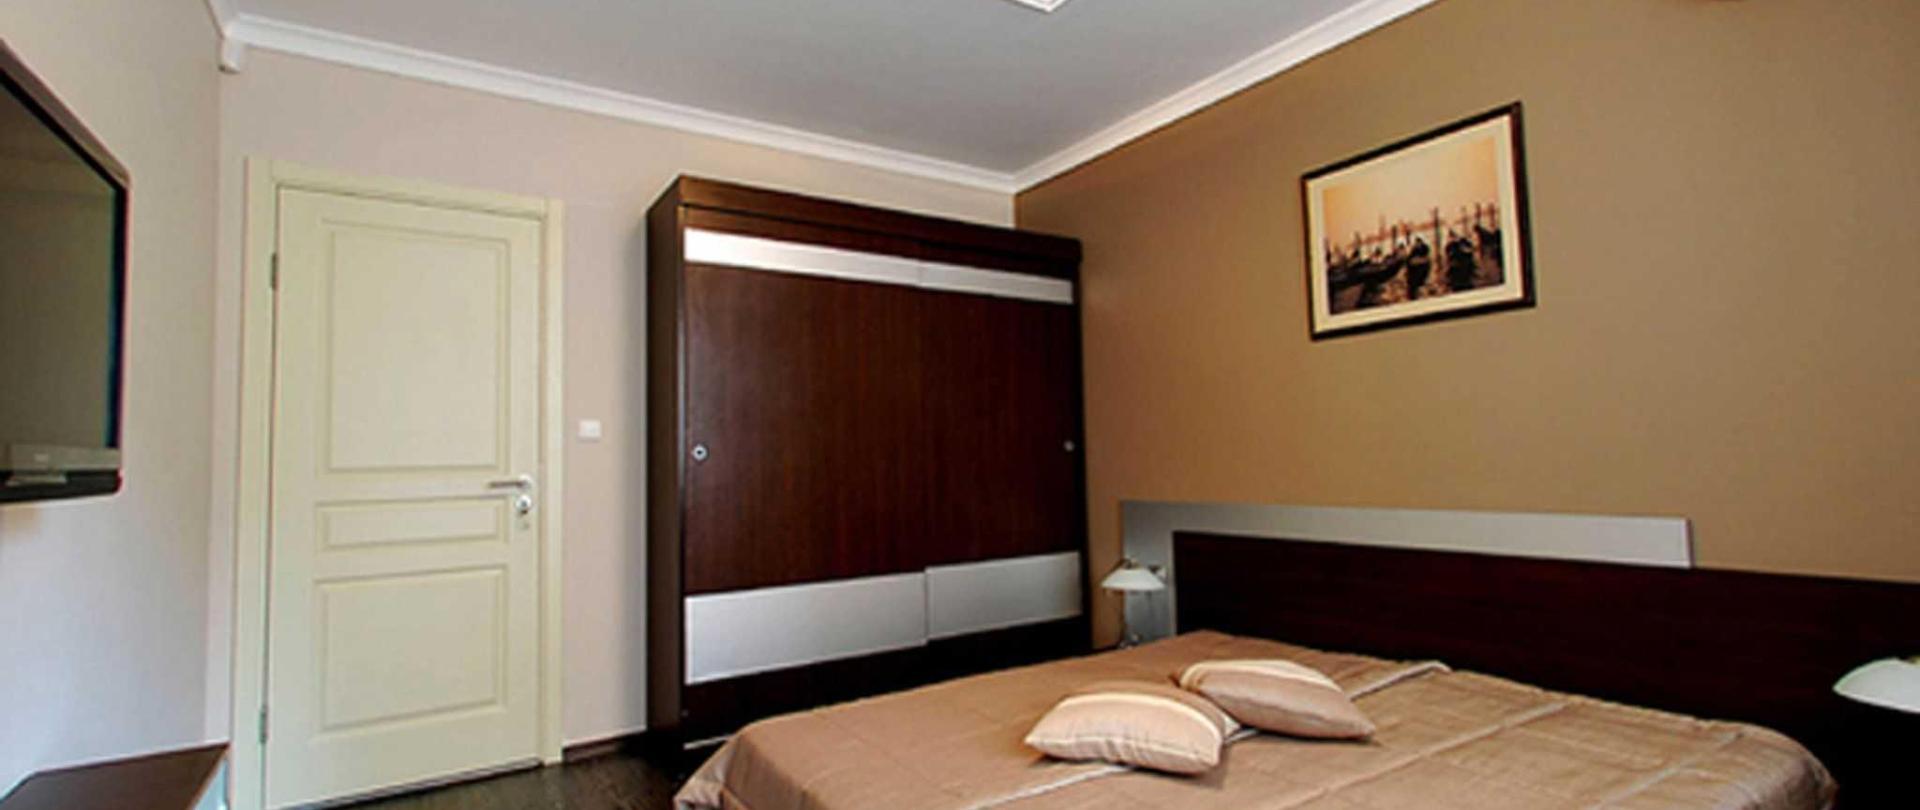 hotel_apartment_bedroom_2.jpg